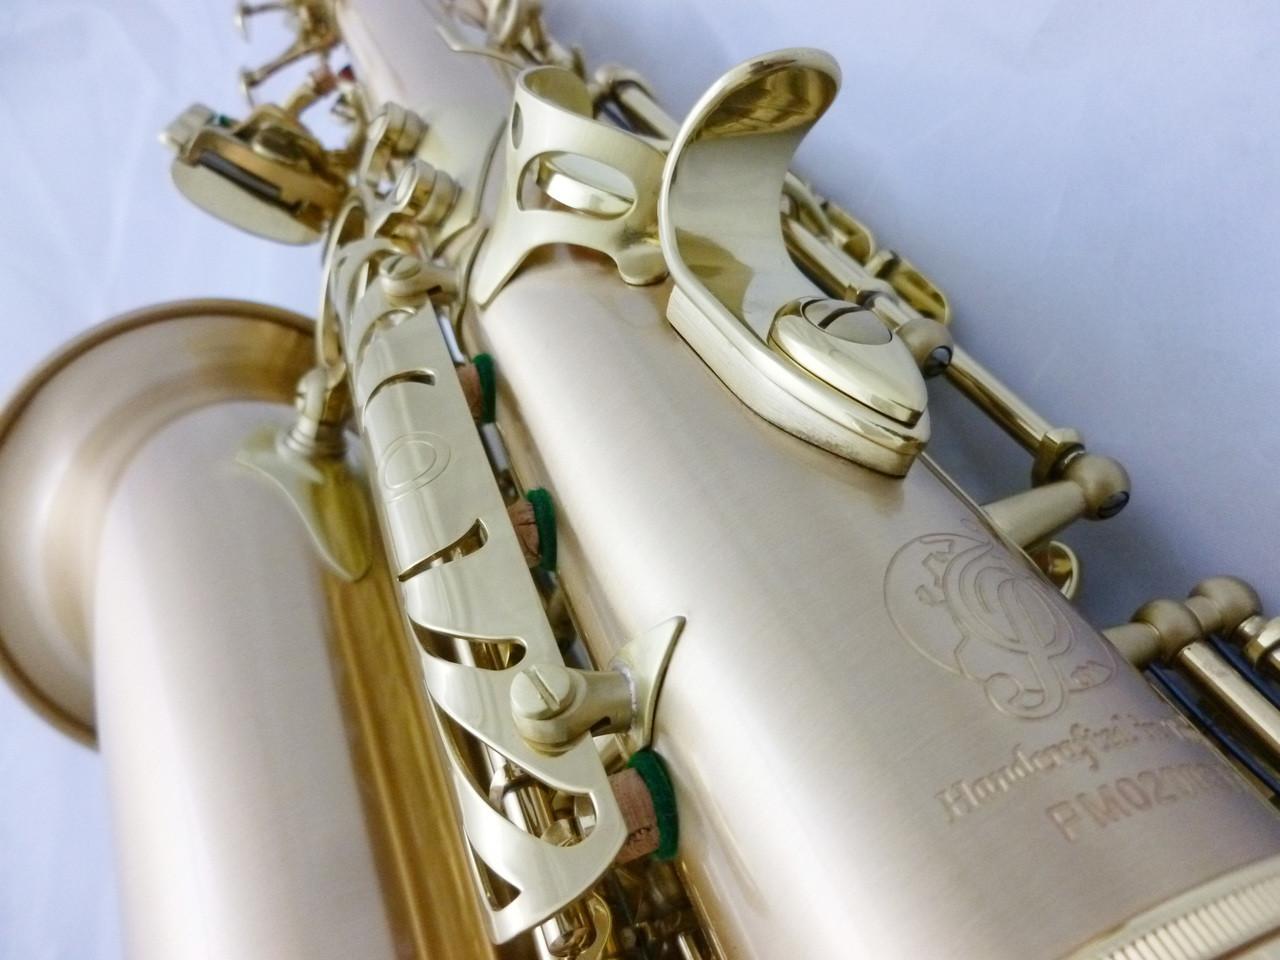 P Mauriat Le Bravo 200 Alto Saxophone 2